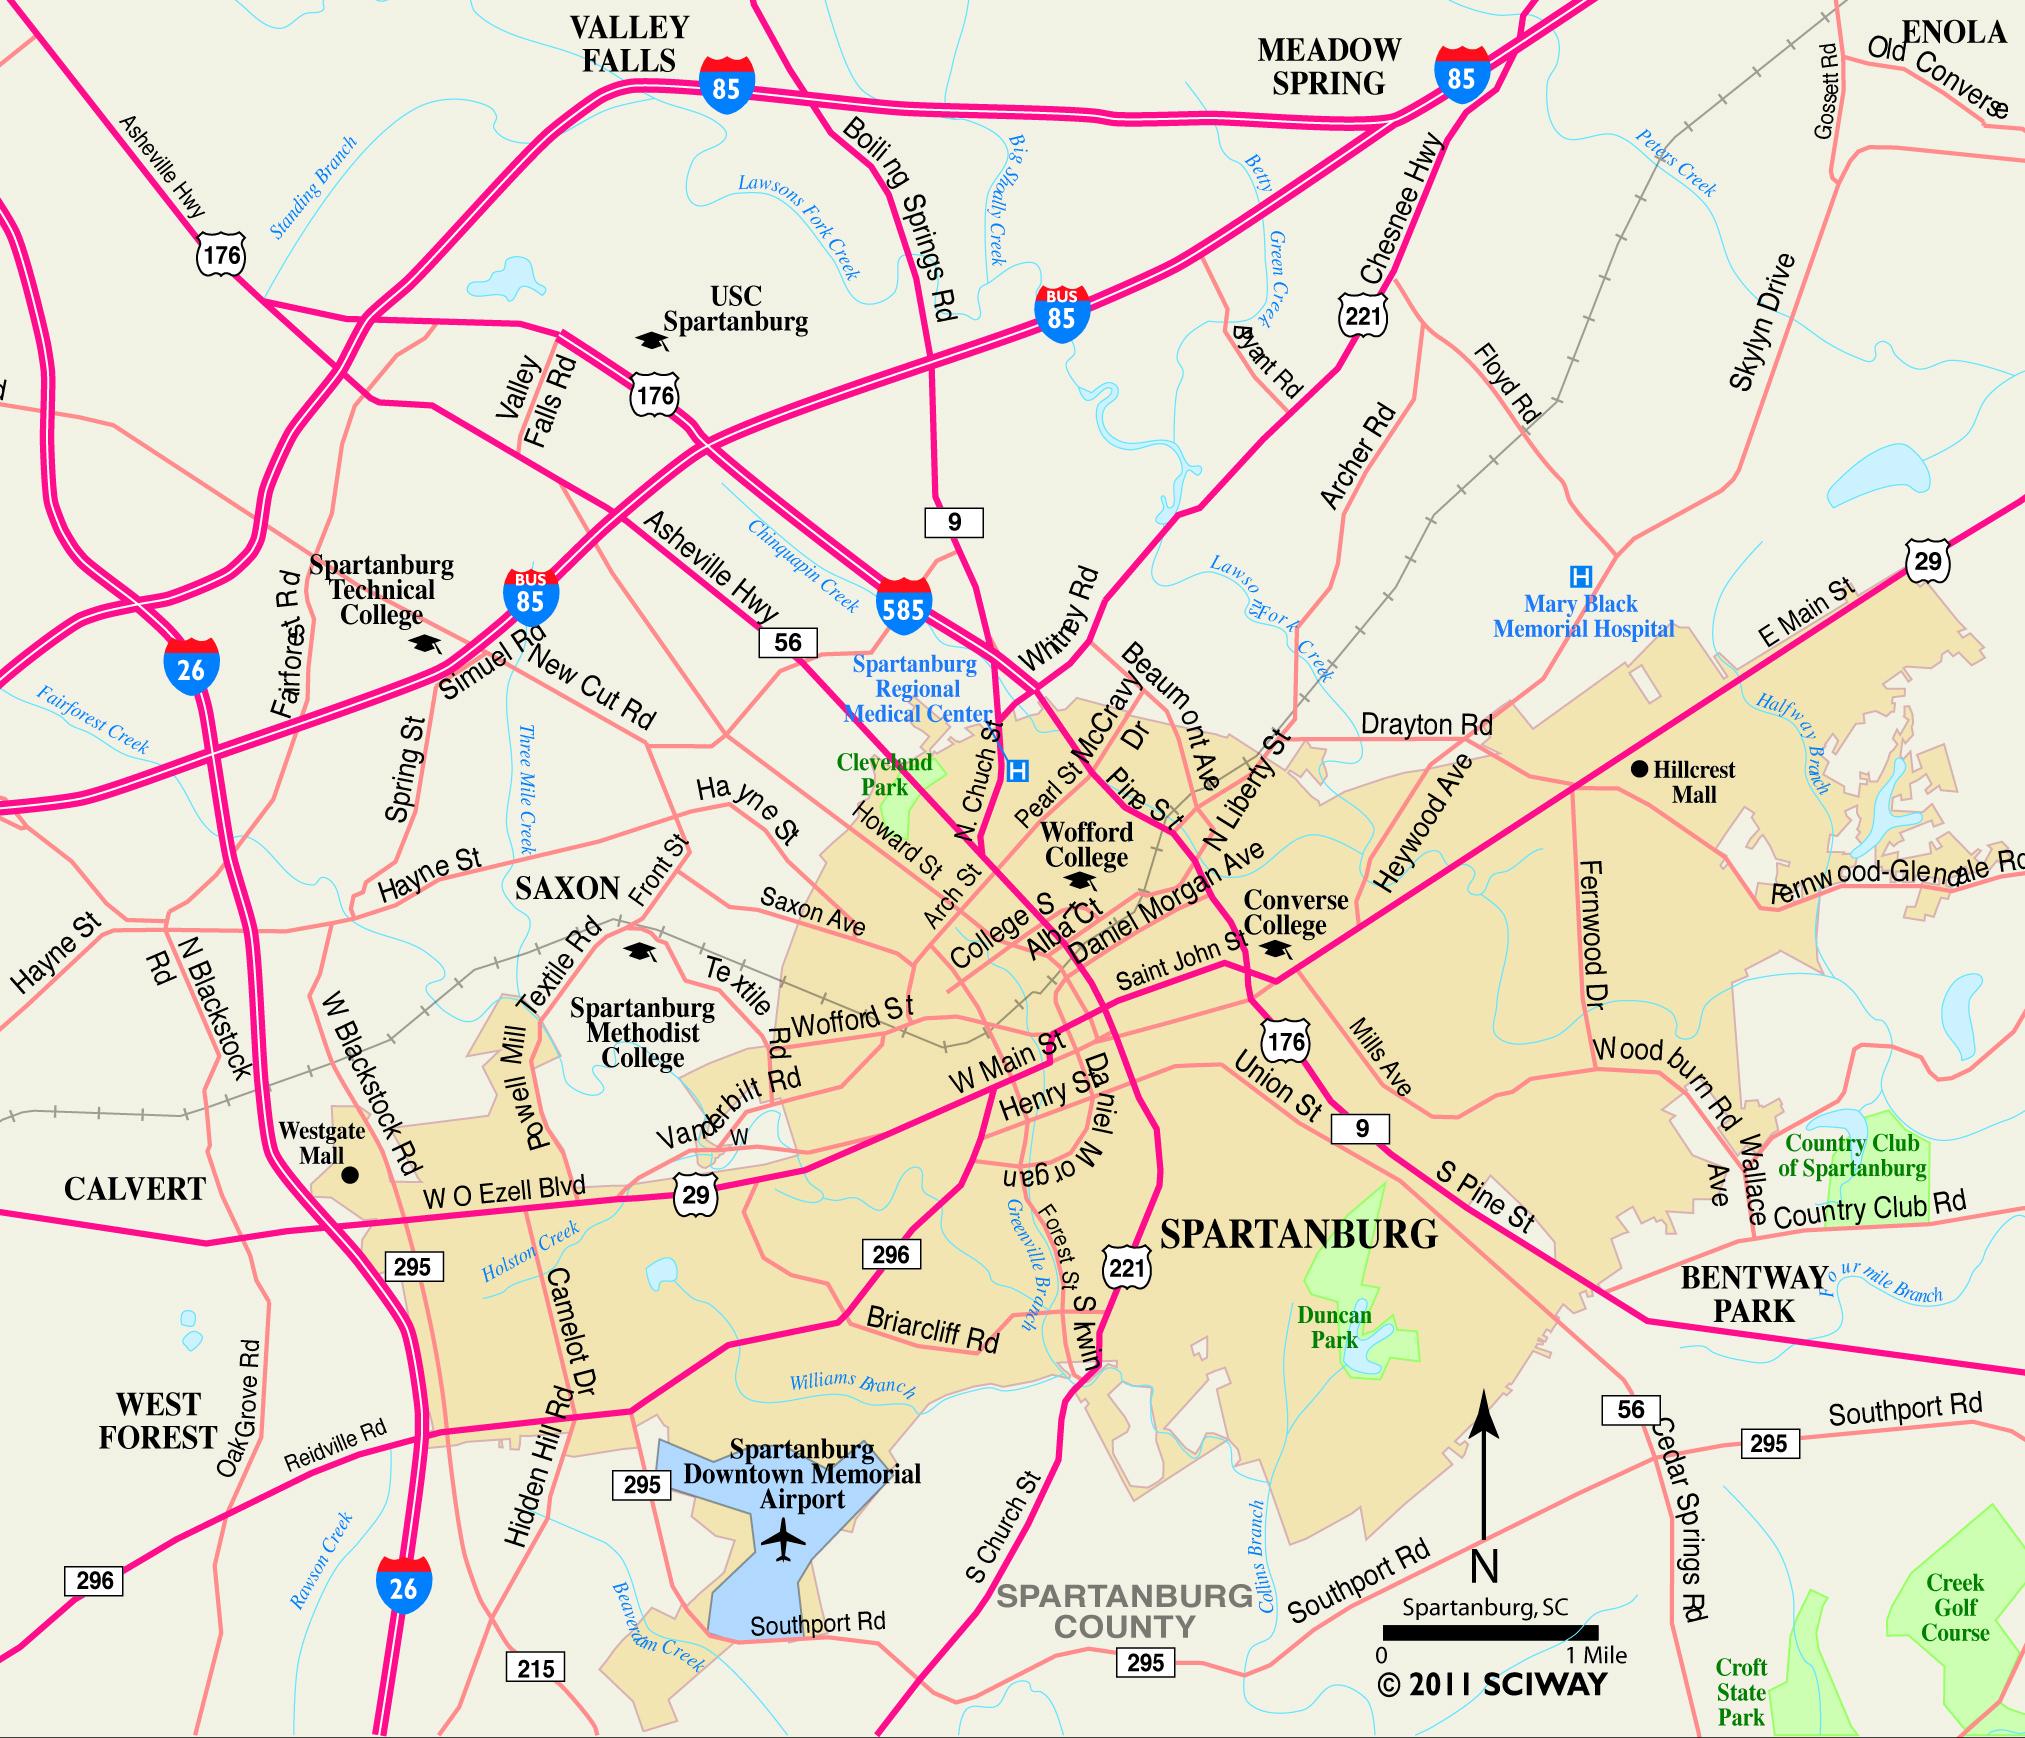 Gmc Columbia Sc >> Charleston South Carolina Sc Profile Population Maps .html | Autos Weblog